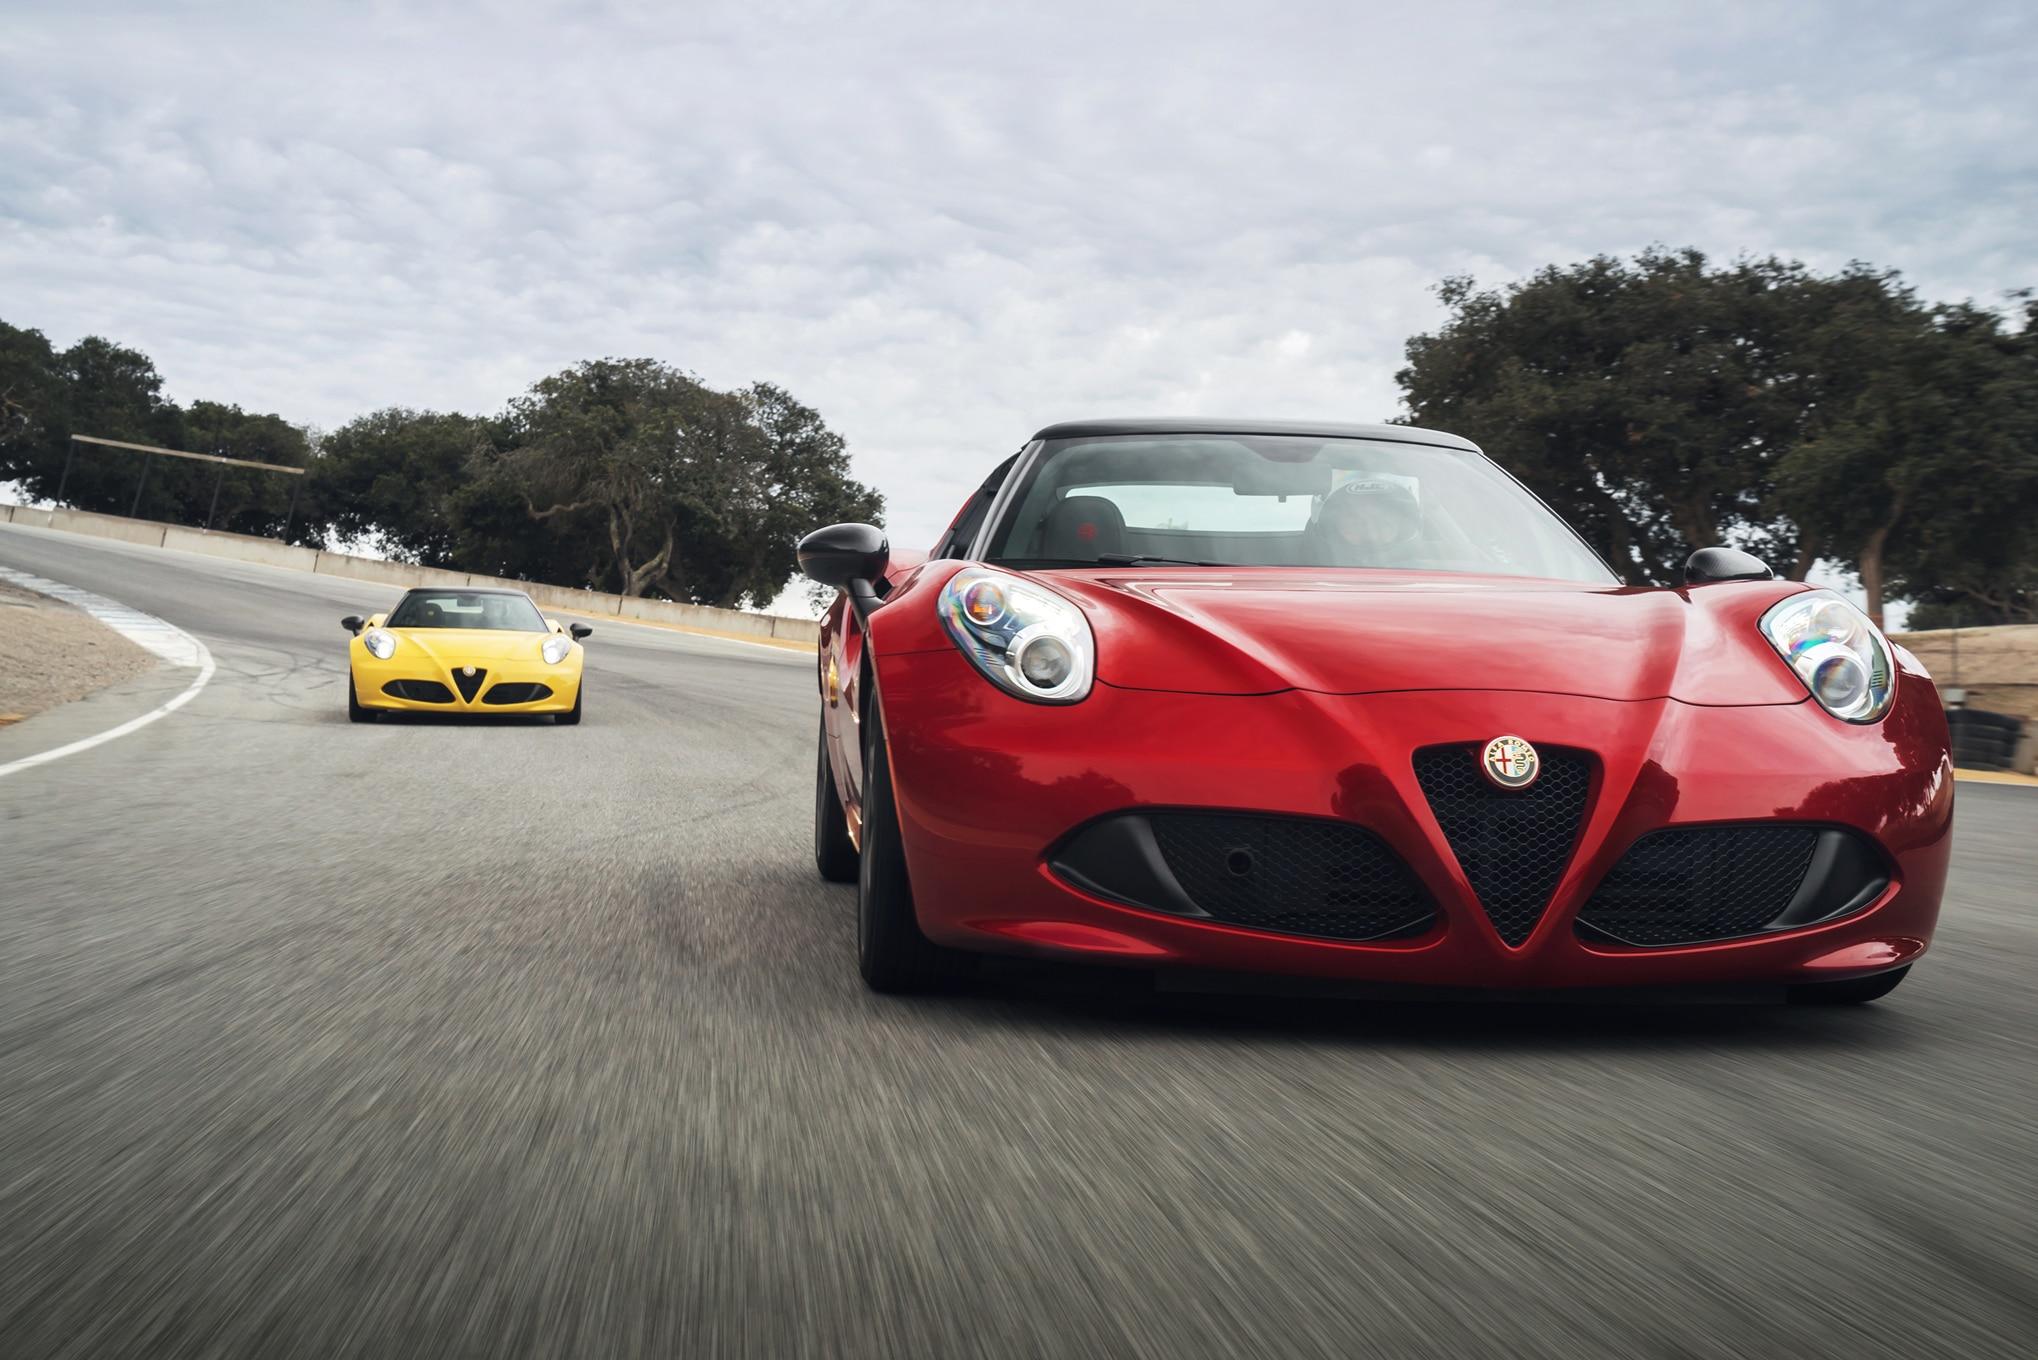 Alfa Romeo 4C Cena — Идеи изображения автомобиРя